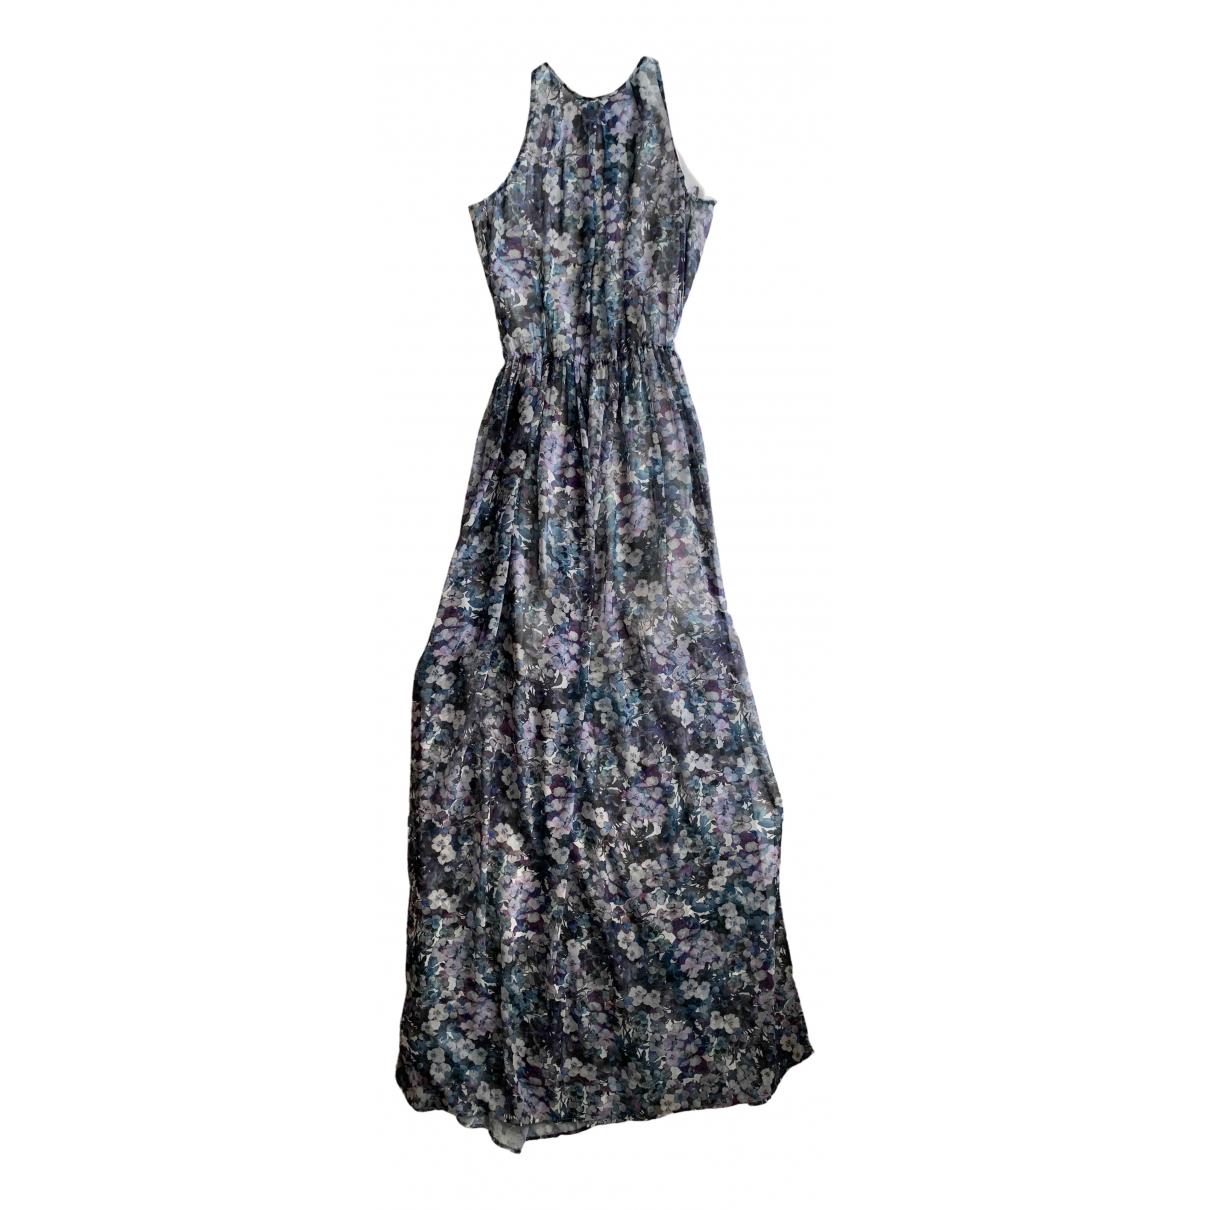 Massimo Dutti \N Blue dress for Women 36 IT